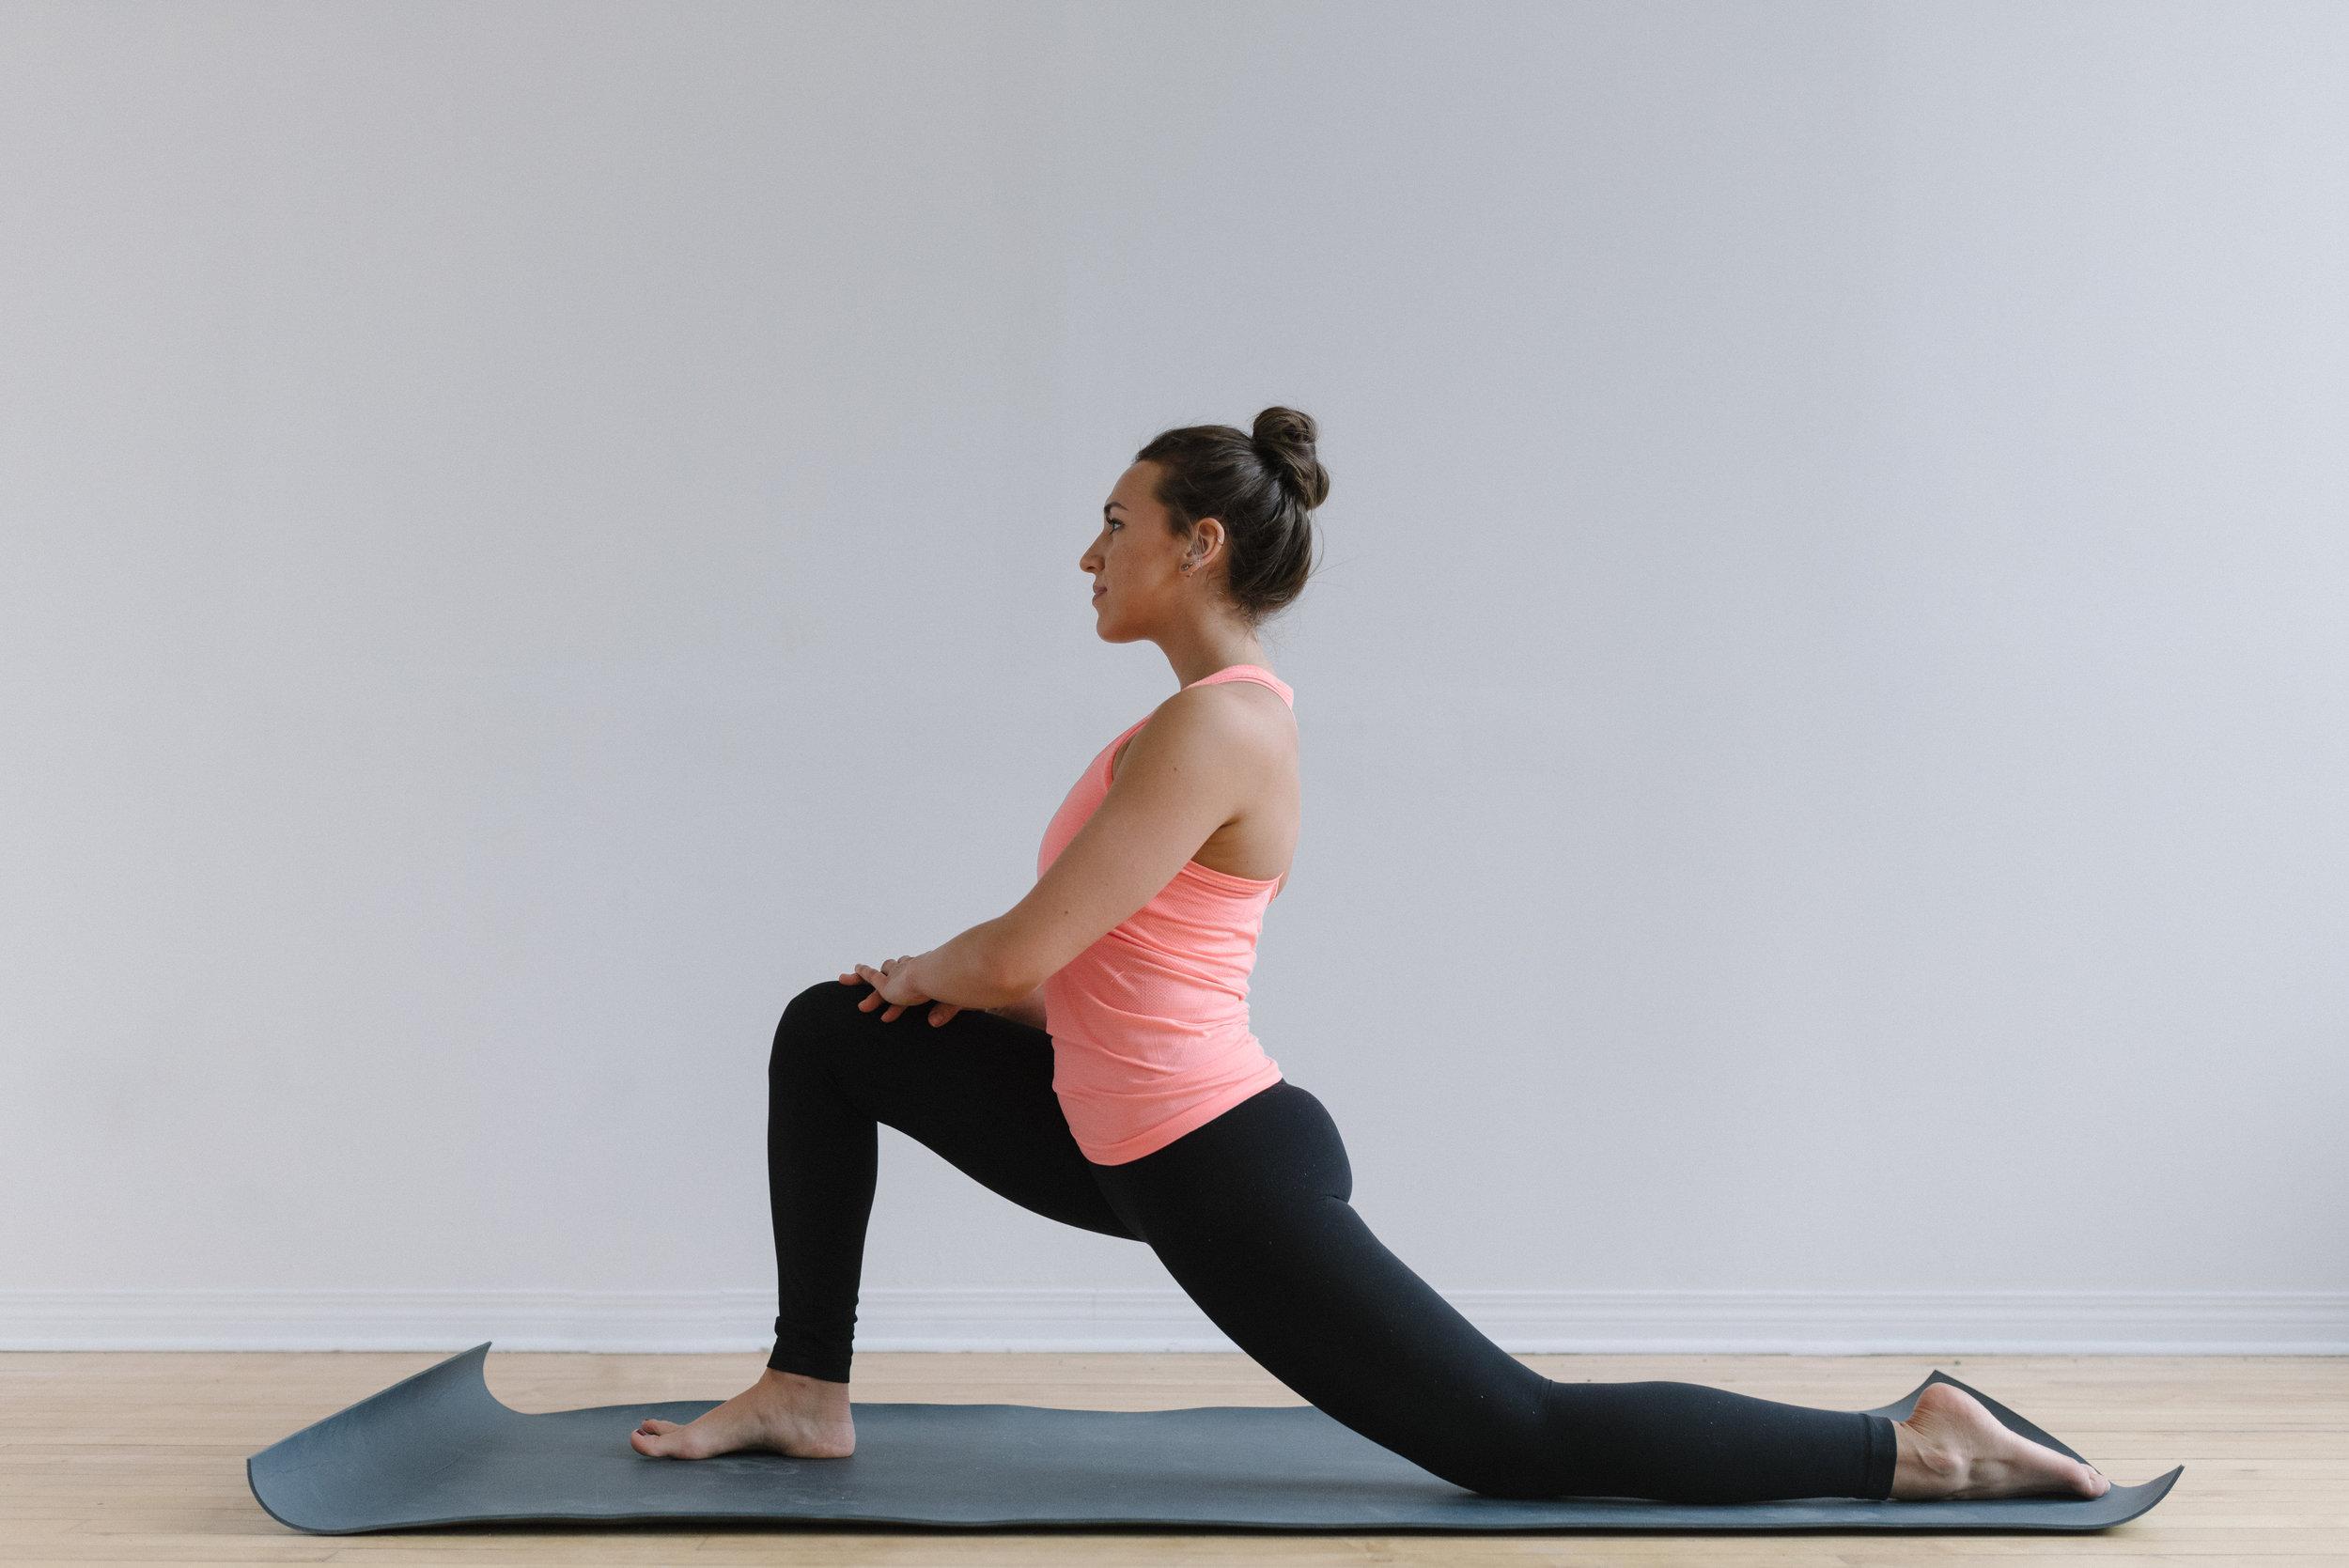 Sam+D+Squire+_+Yoga+_+Meditation+_+Splits+_+Yoga+Pose+_+Yoga+Sequence+_+At-Home+Yoga.jpeg